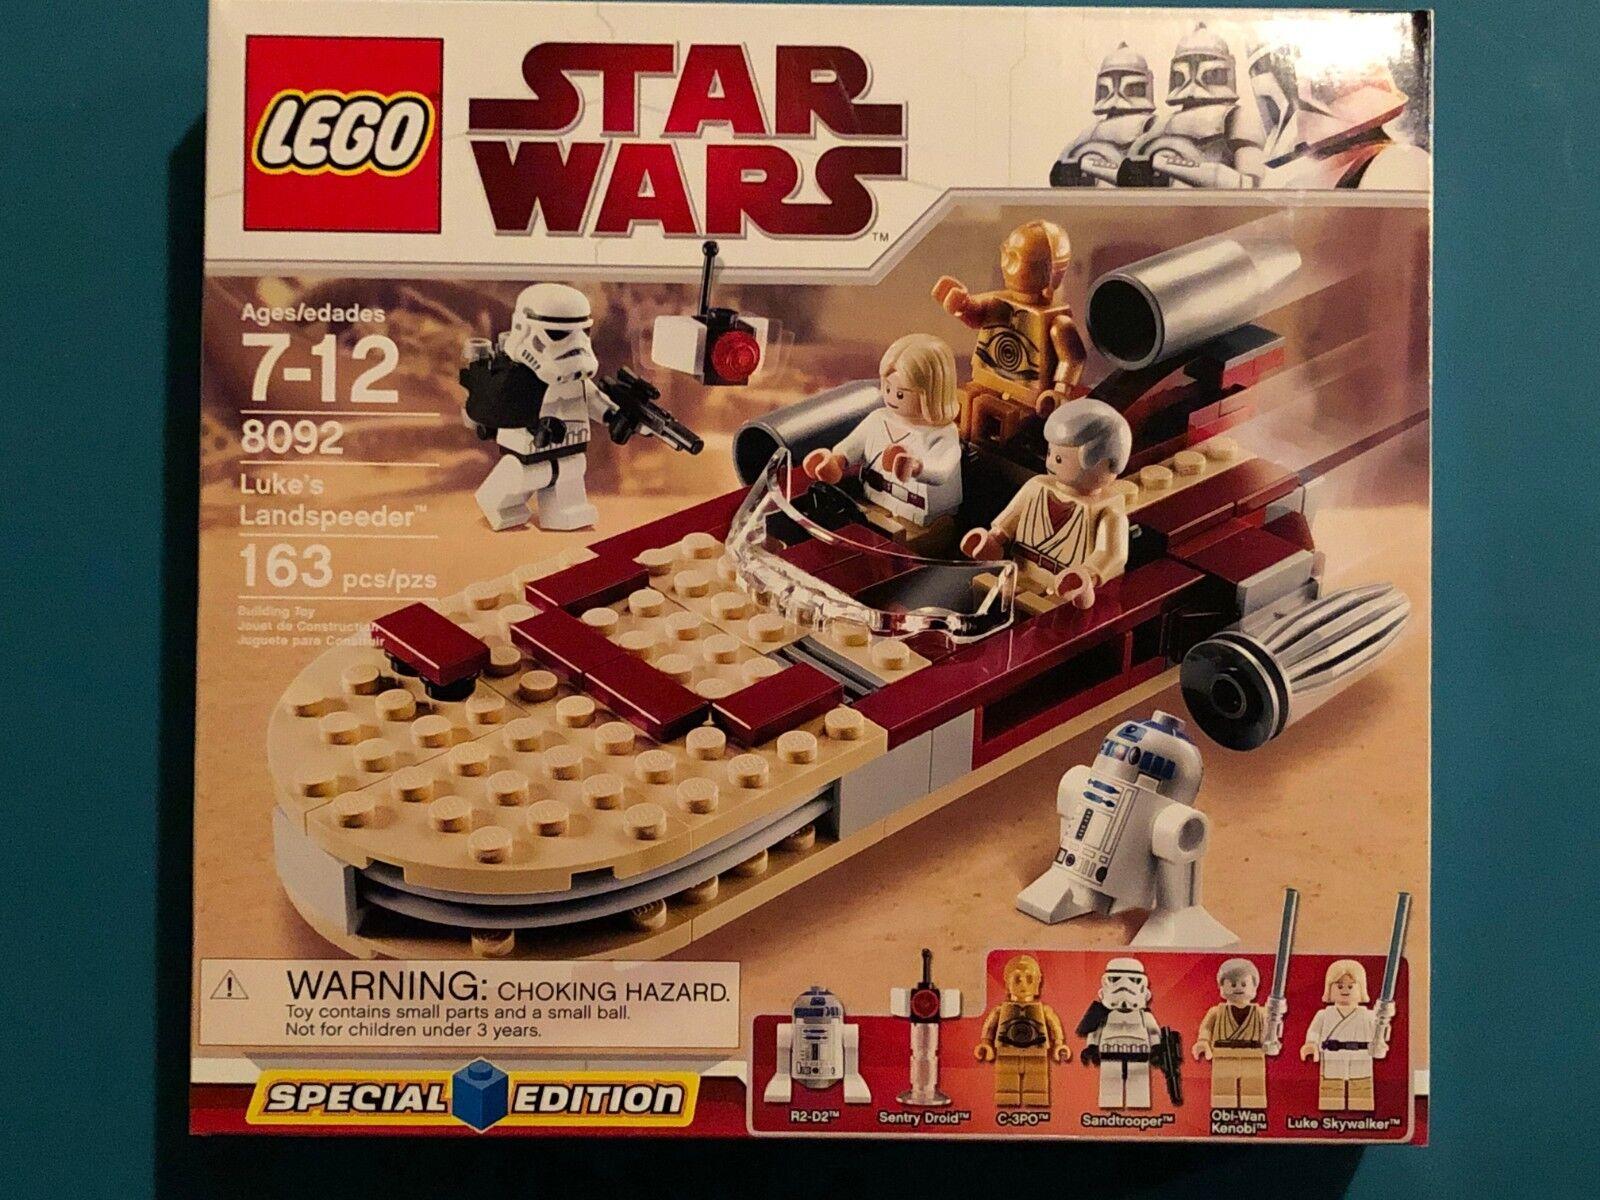 LEGO STAR WARS LOT 8092 75198 75136 A NEW HOPE ANAKIN OBI-WAN JAWA SEALED